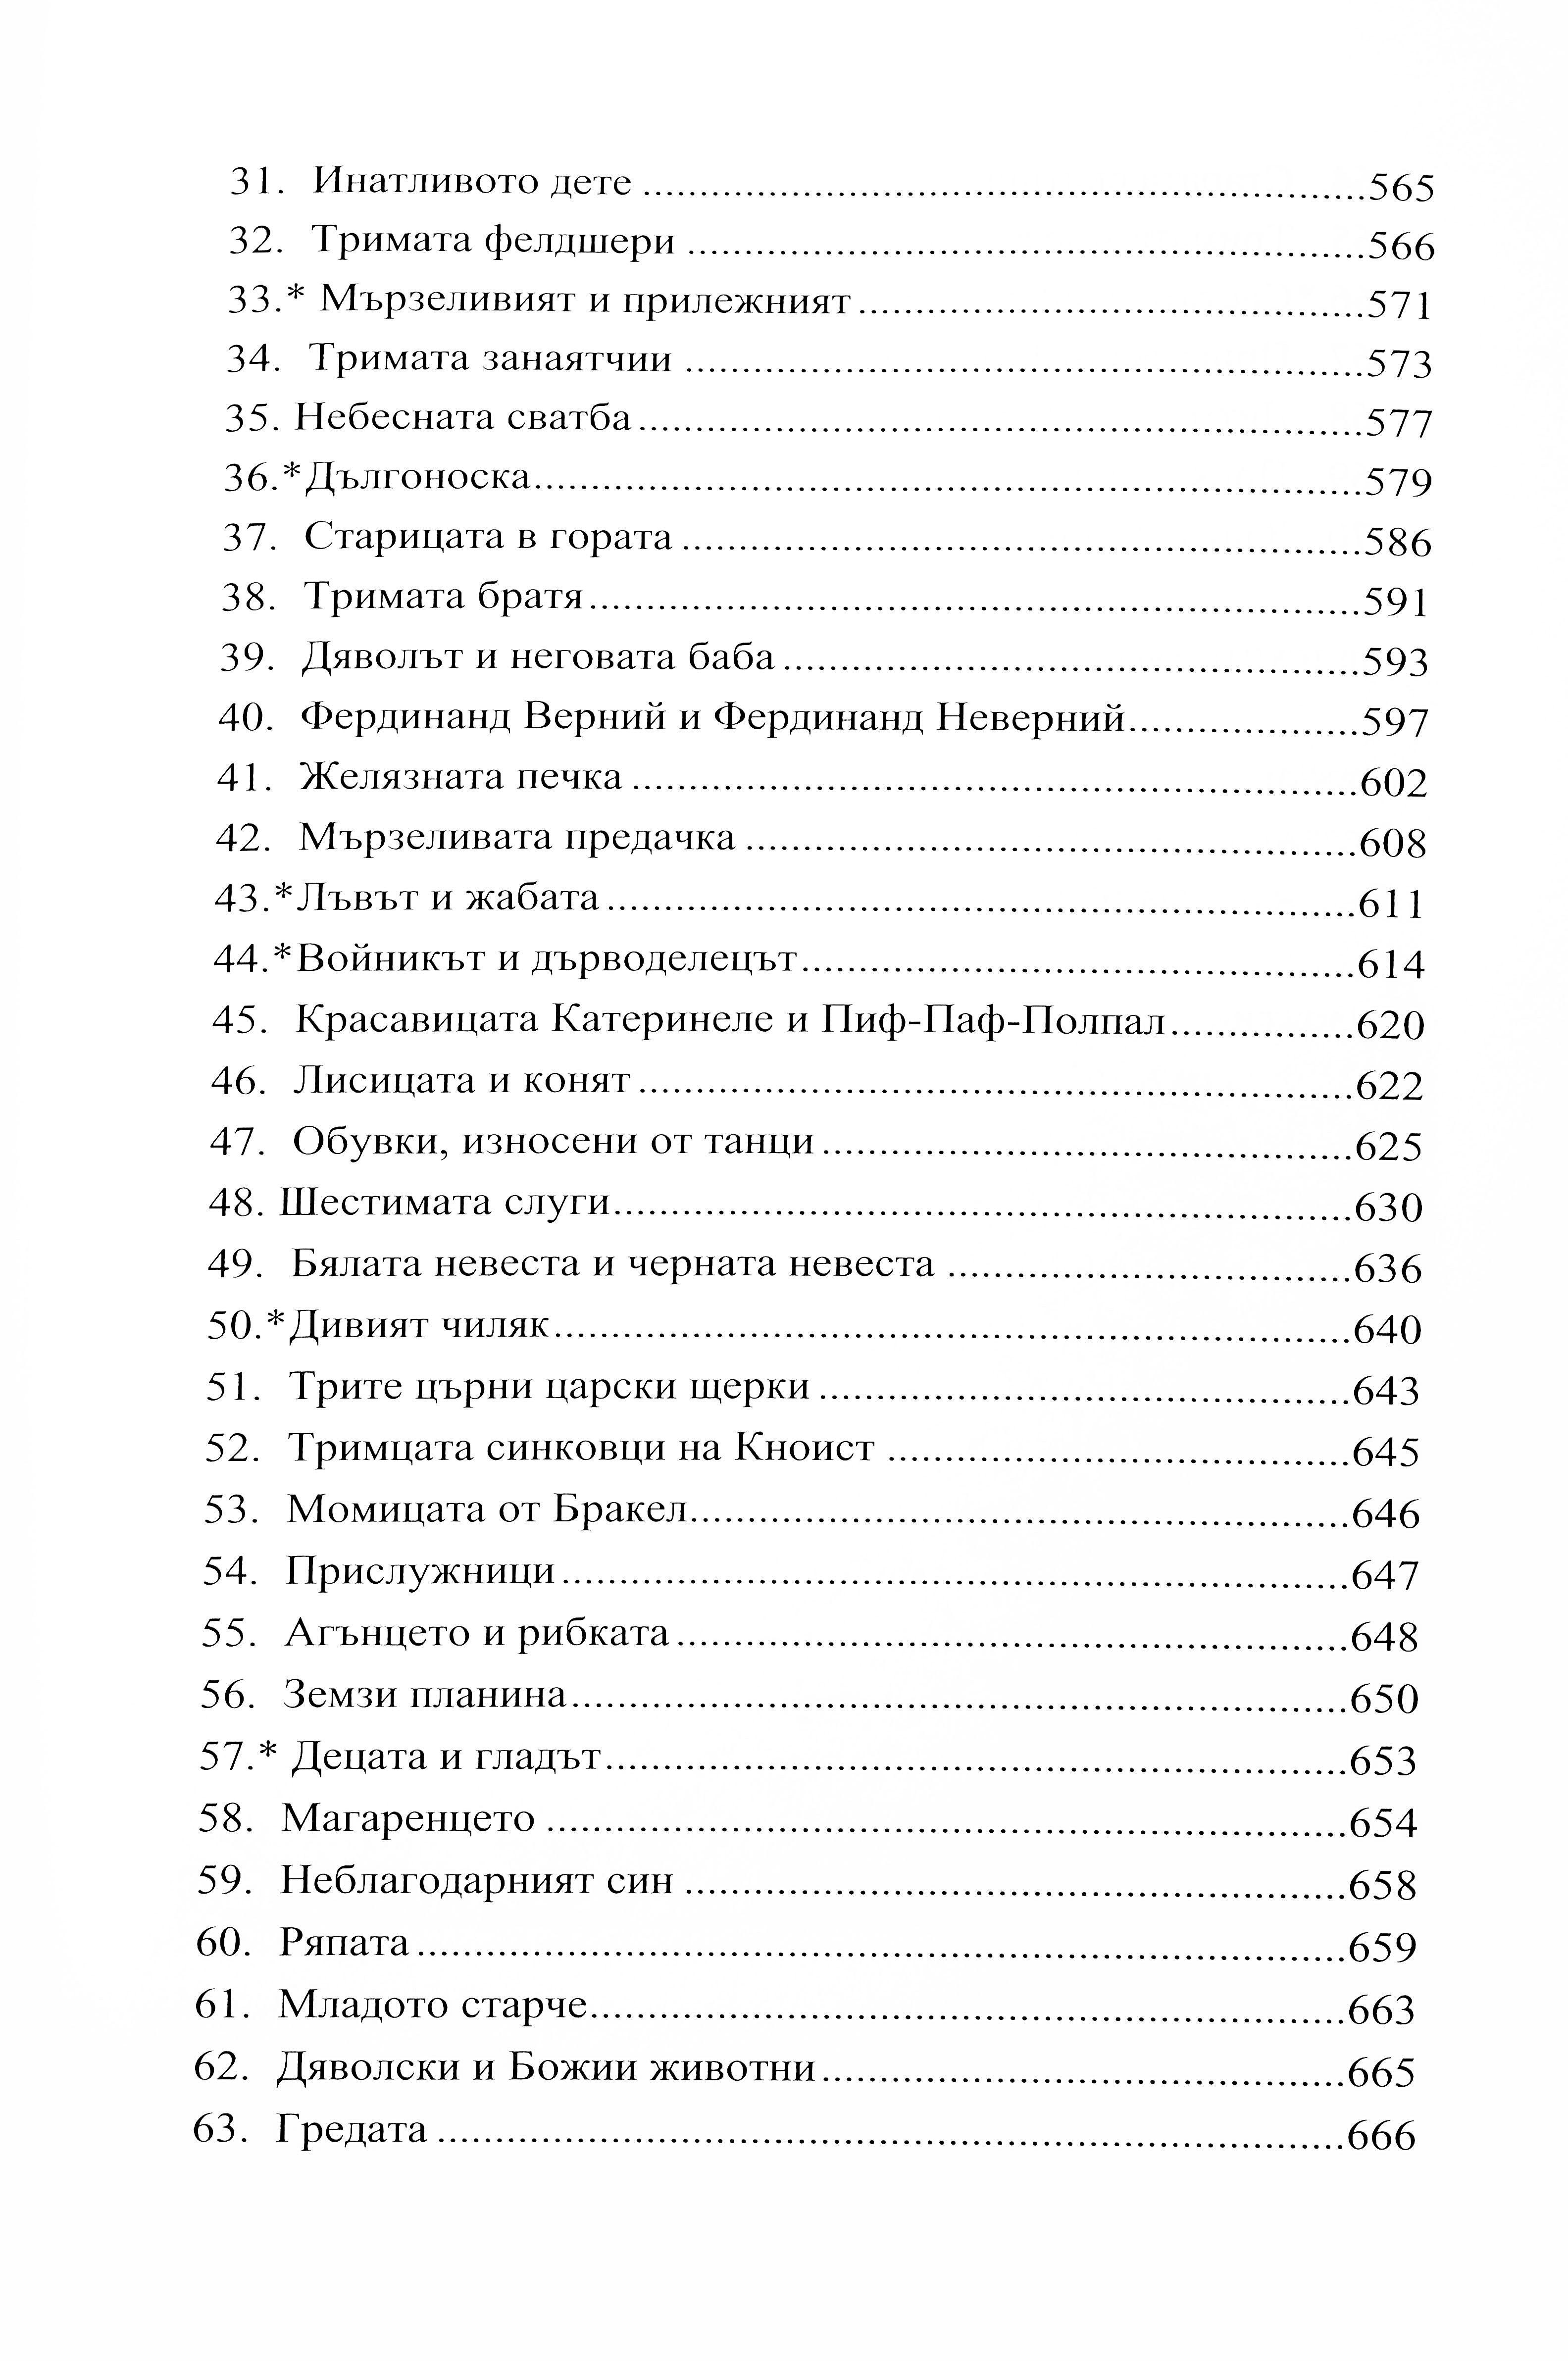 detski-i-domashni-prikazki-tvardi-koritsi-10 - 11